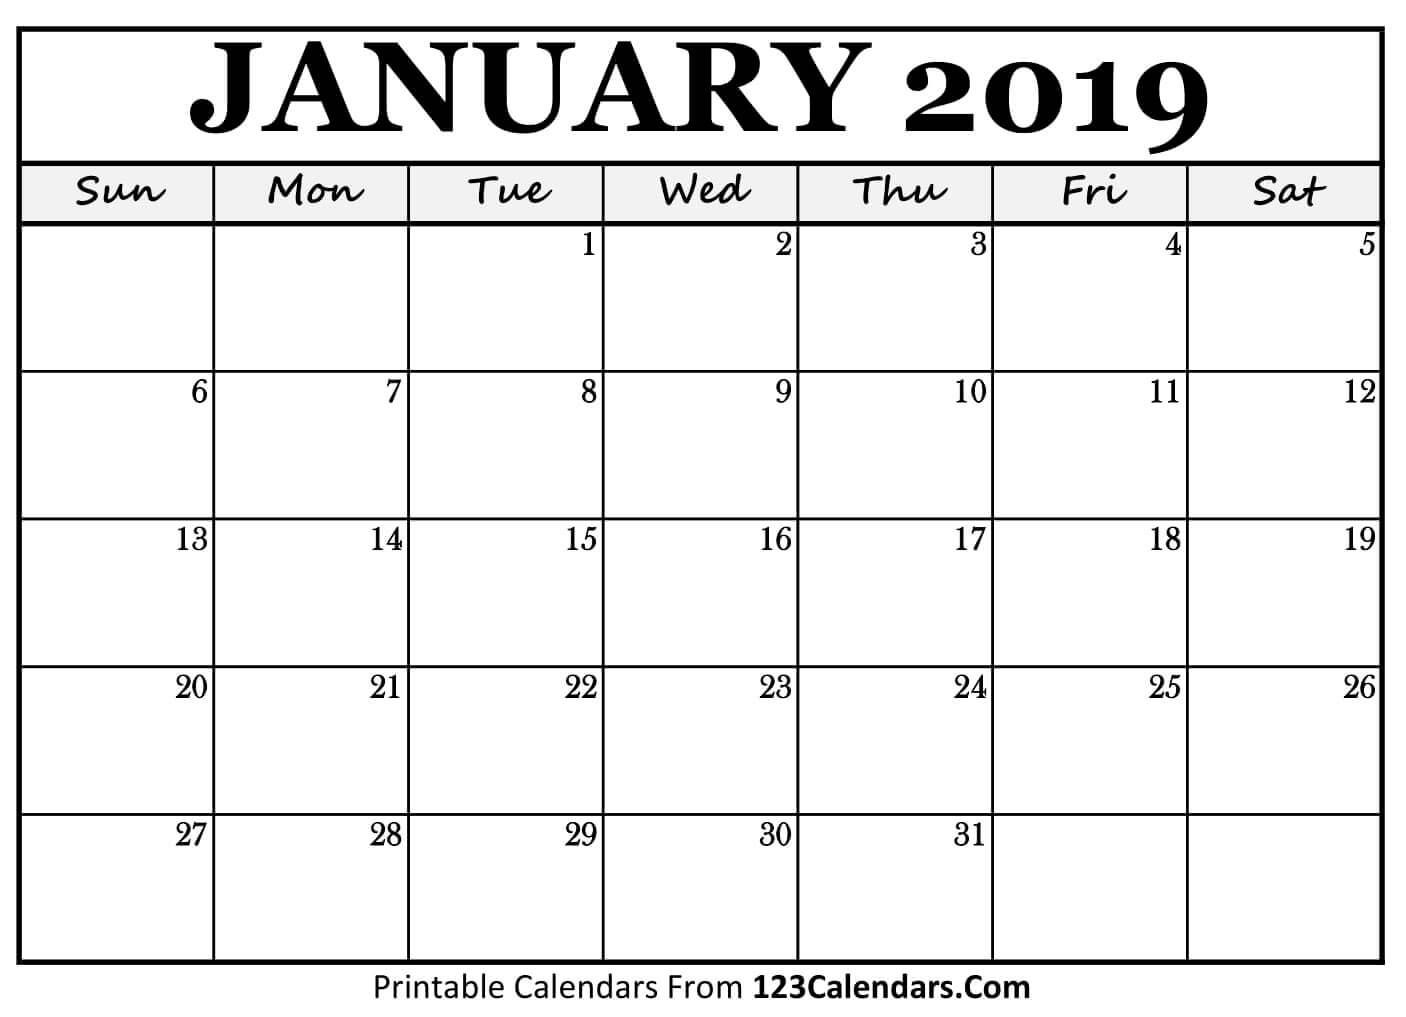 Printable Calendar Jan 2019